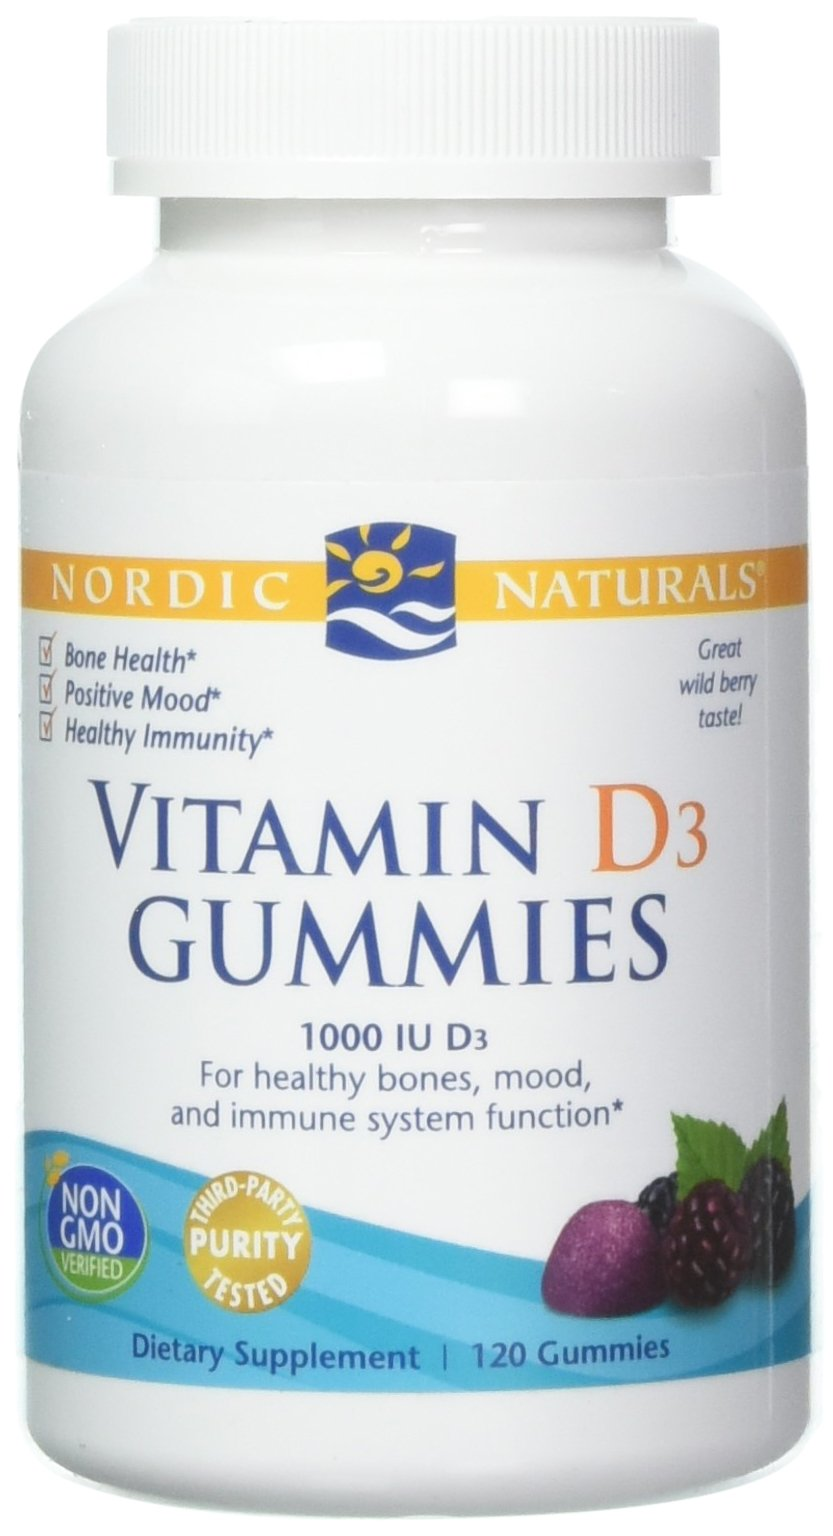 Nordic Naturals, Vitamin D3 Gummies, 120 Count by Nordic Naturals (Image #1)